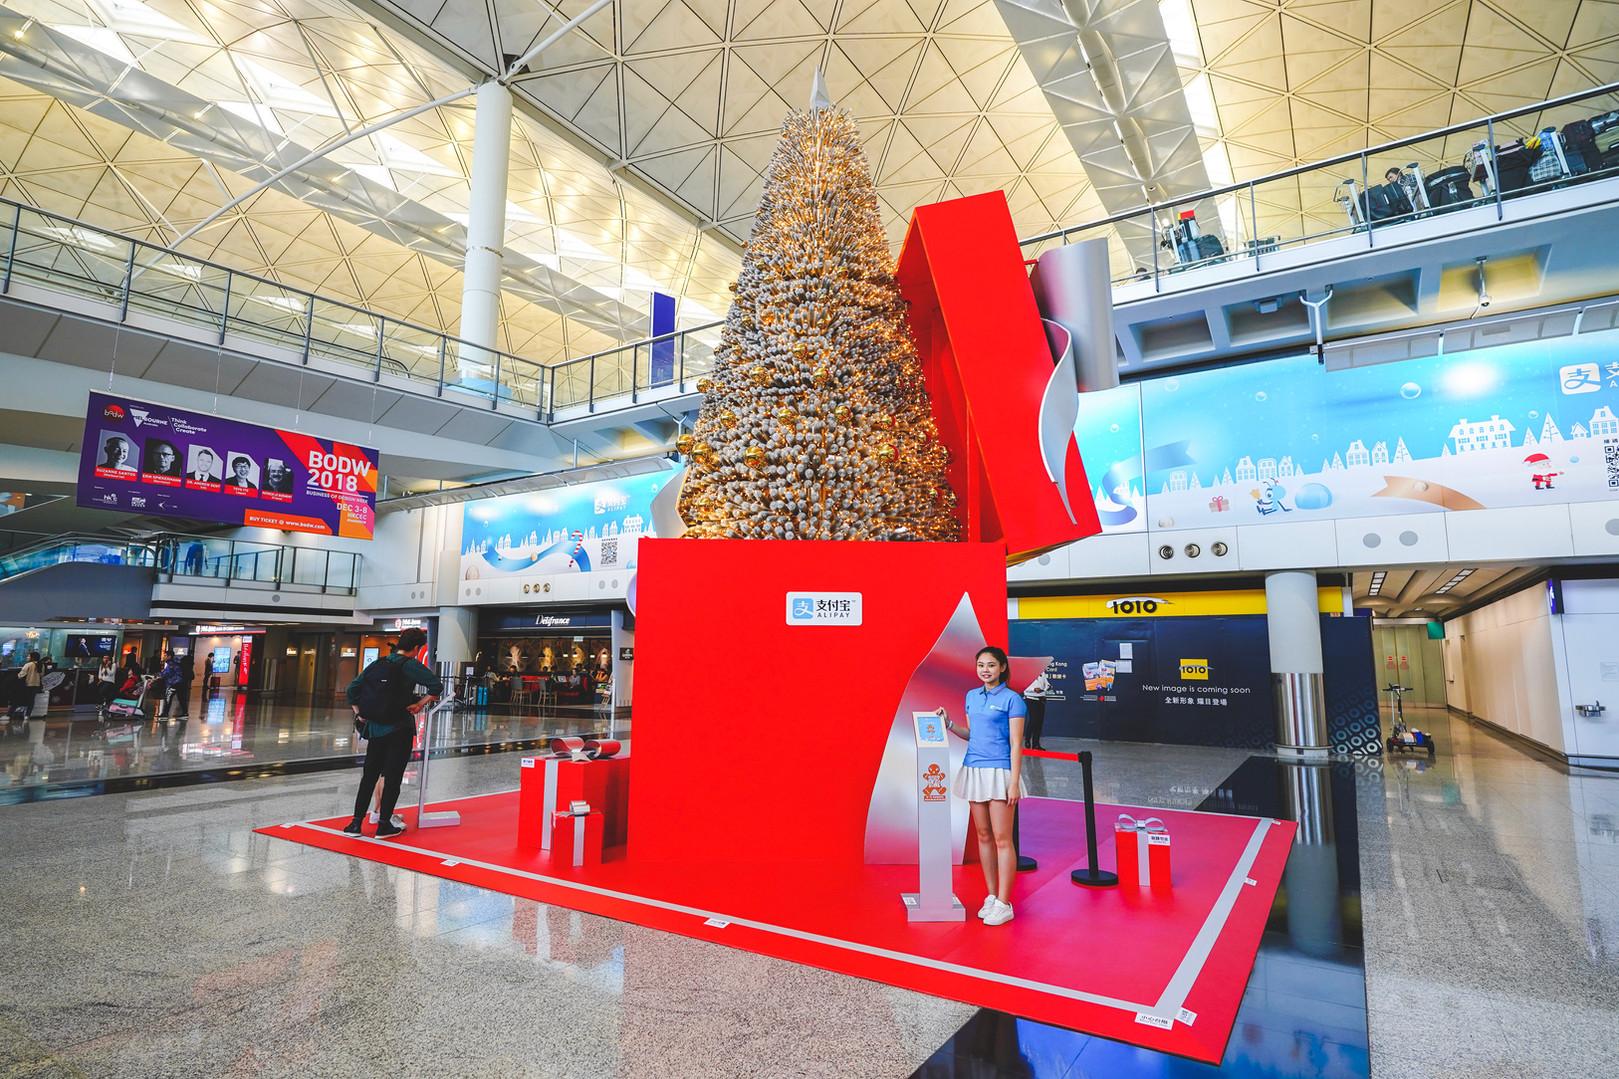 Alipay Christmas Decoration @ HKIA 支付宝圣诞装饰 @ 香港国际机场 2018